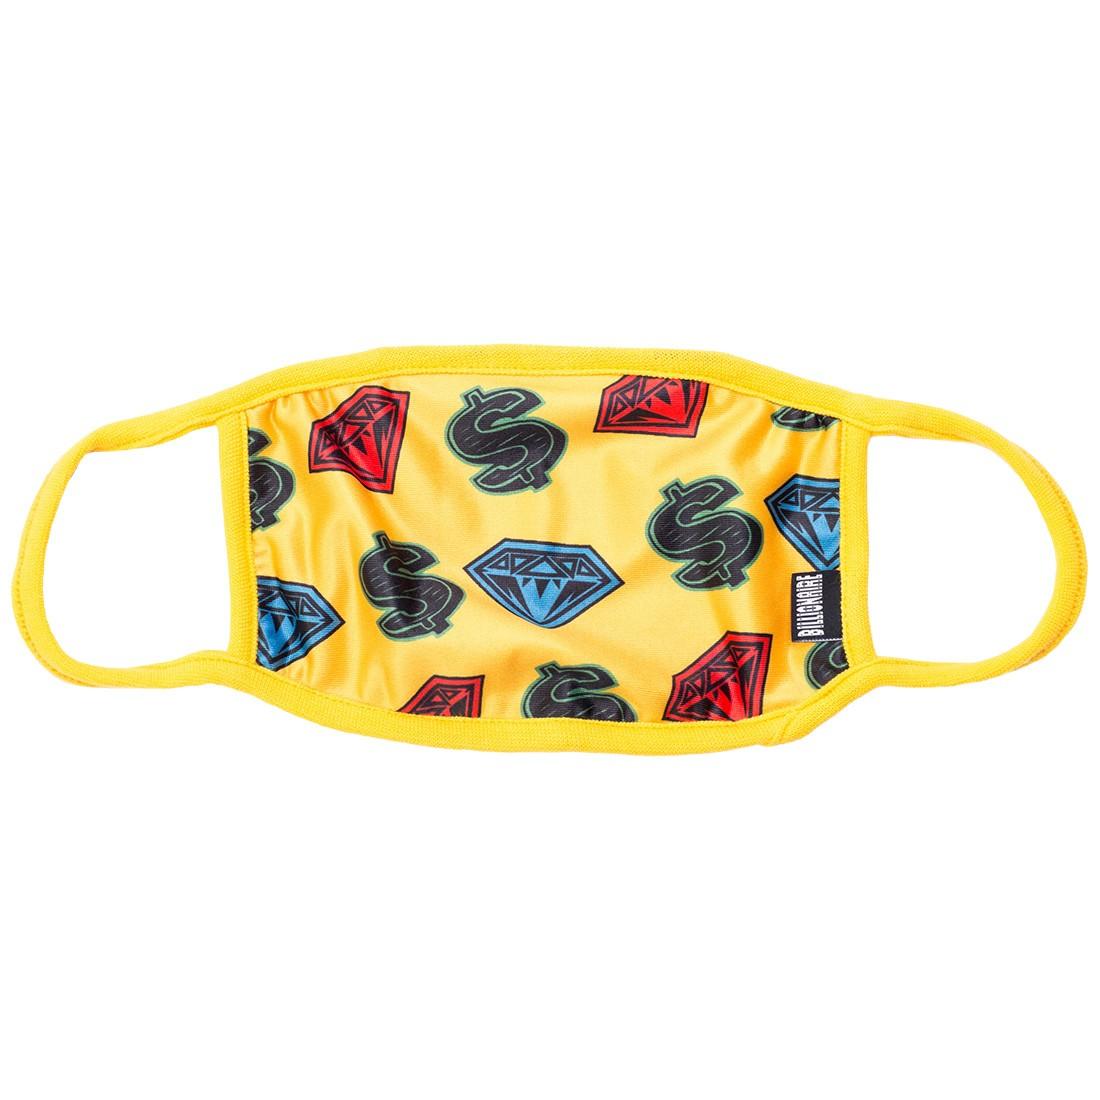 Billionaire Boys Club Iconography Mask (yellow)